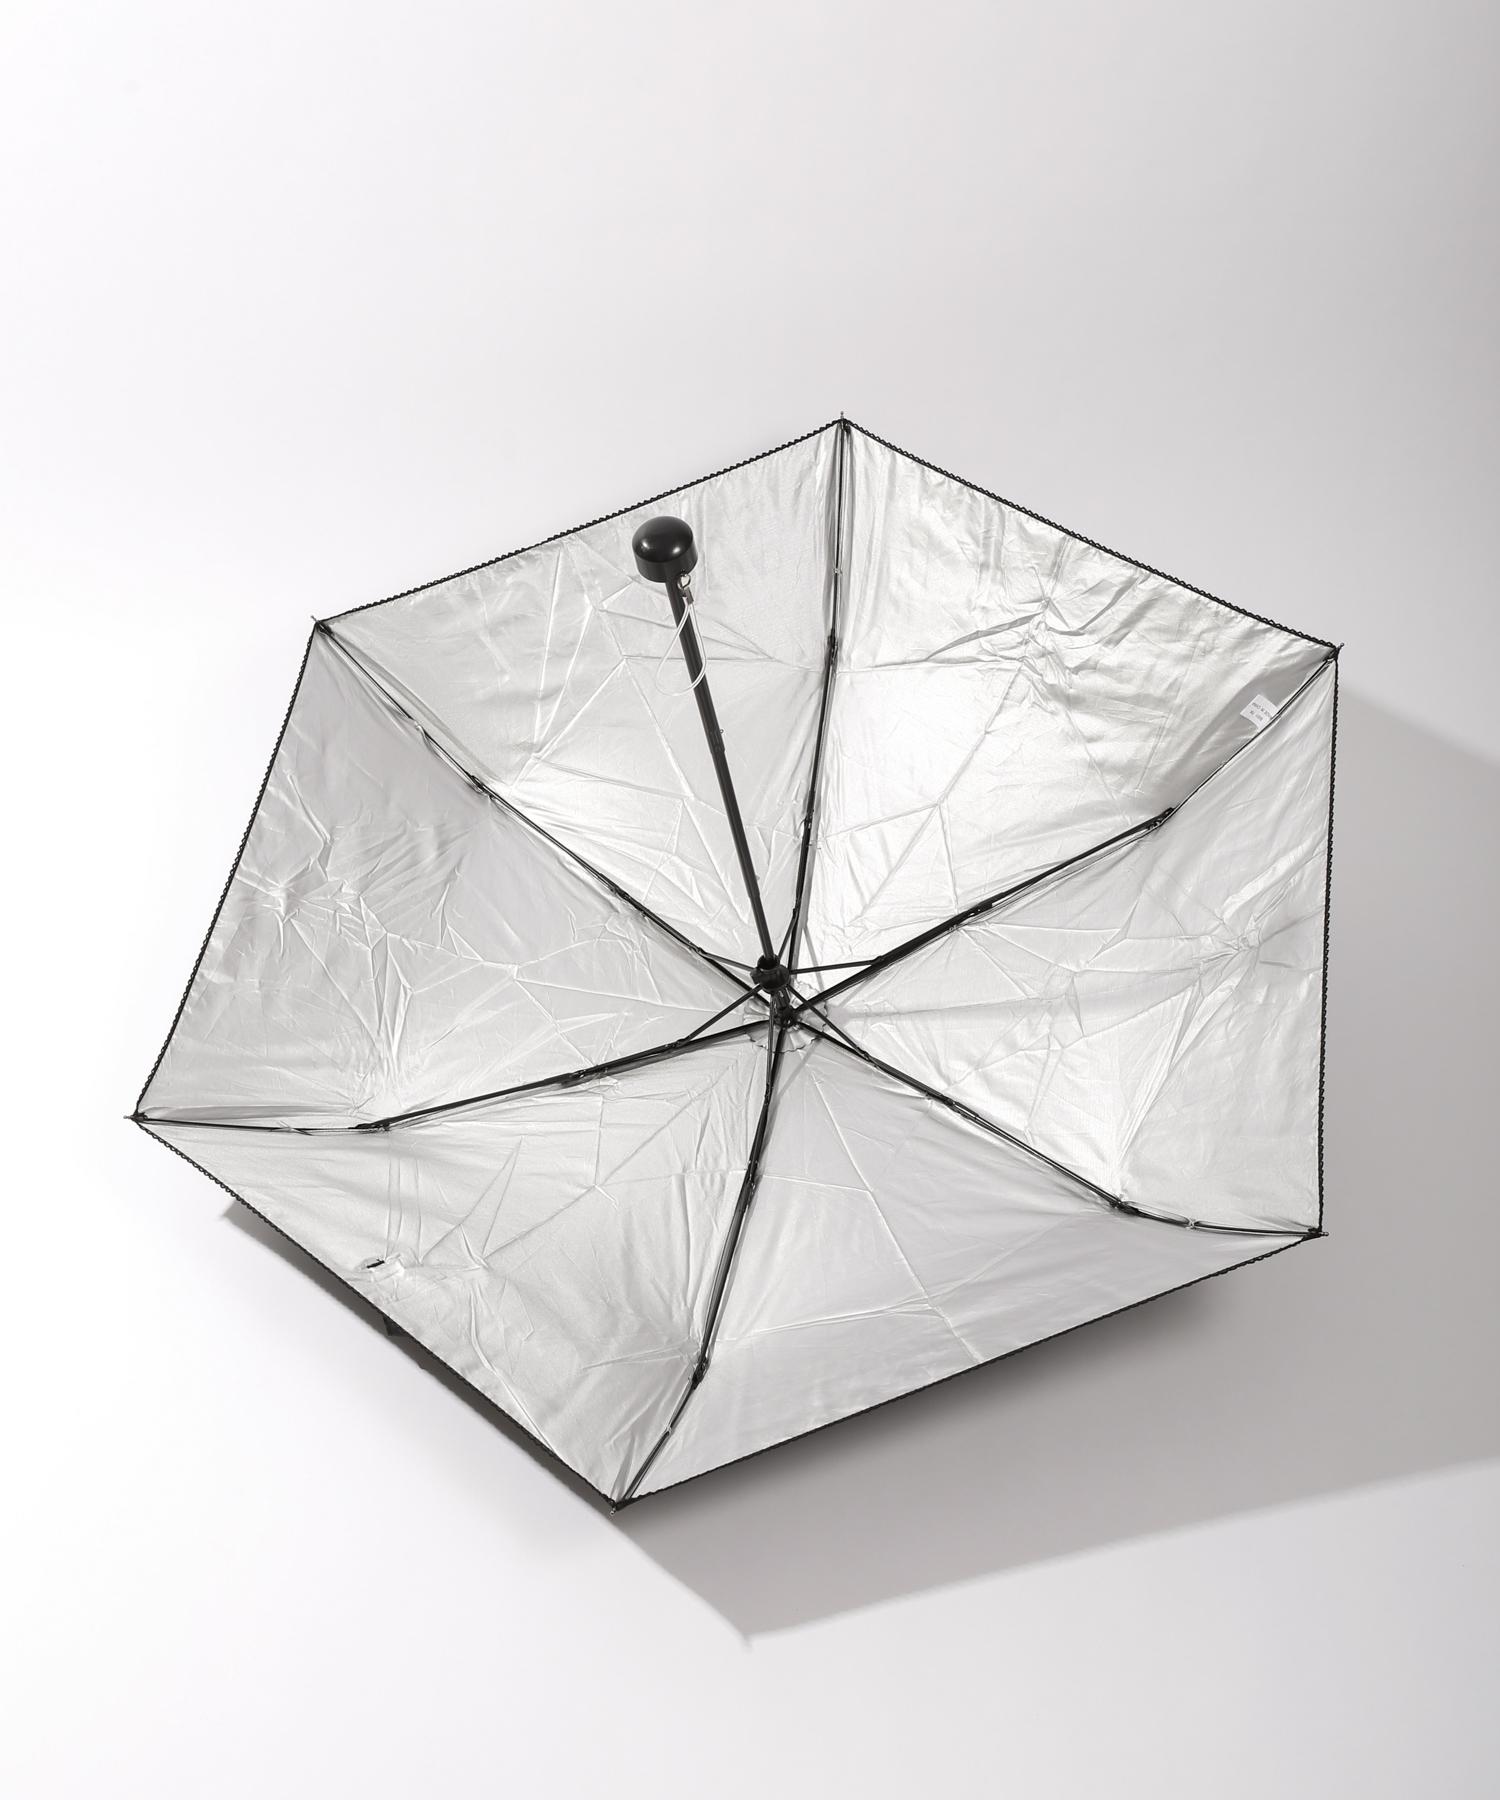 3COINS(スリーコインズ) 晴雨兼用折傘ピコ無地